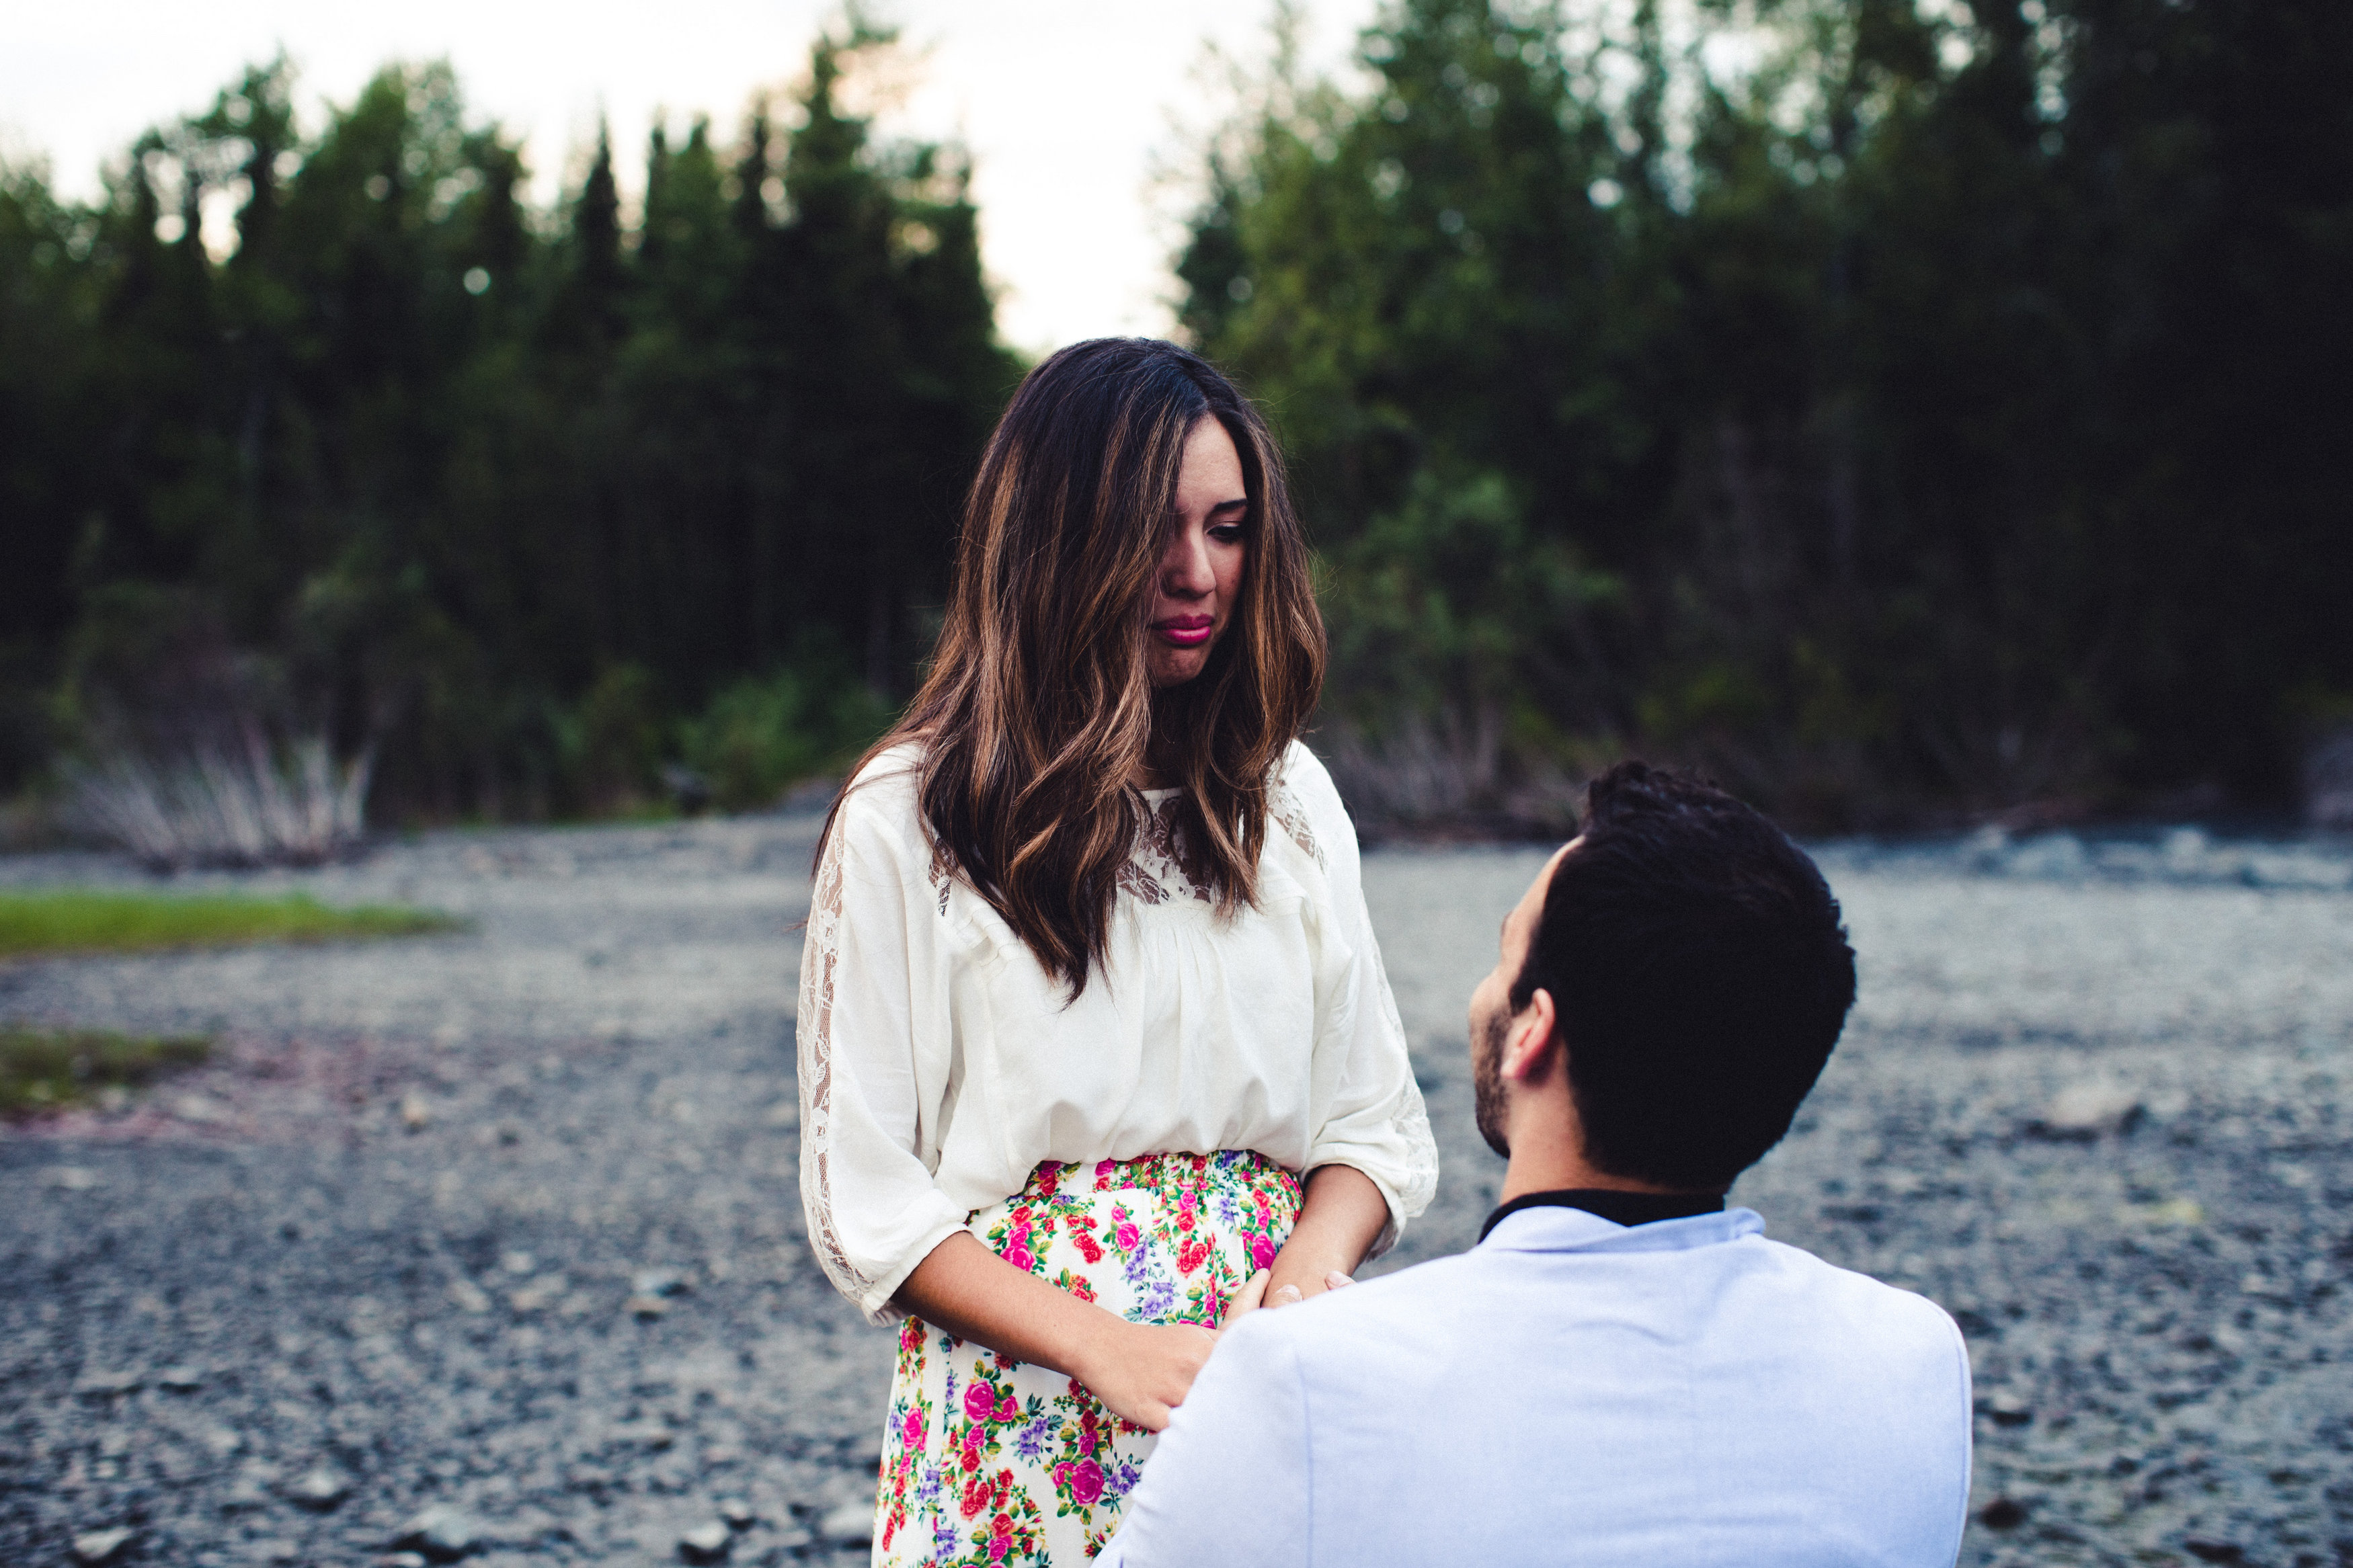 Image 5 of Rebeca and Josh's Beautiful Proposal in Alaska